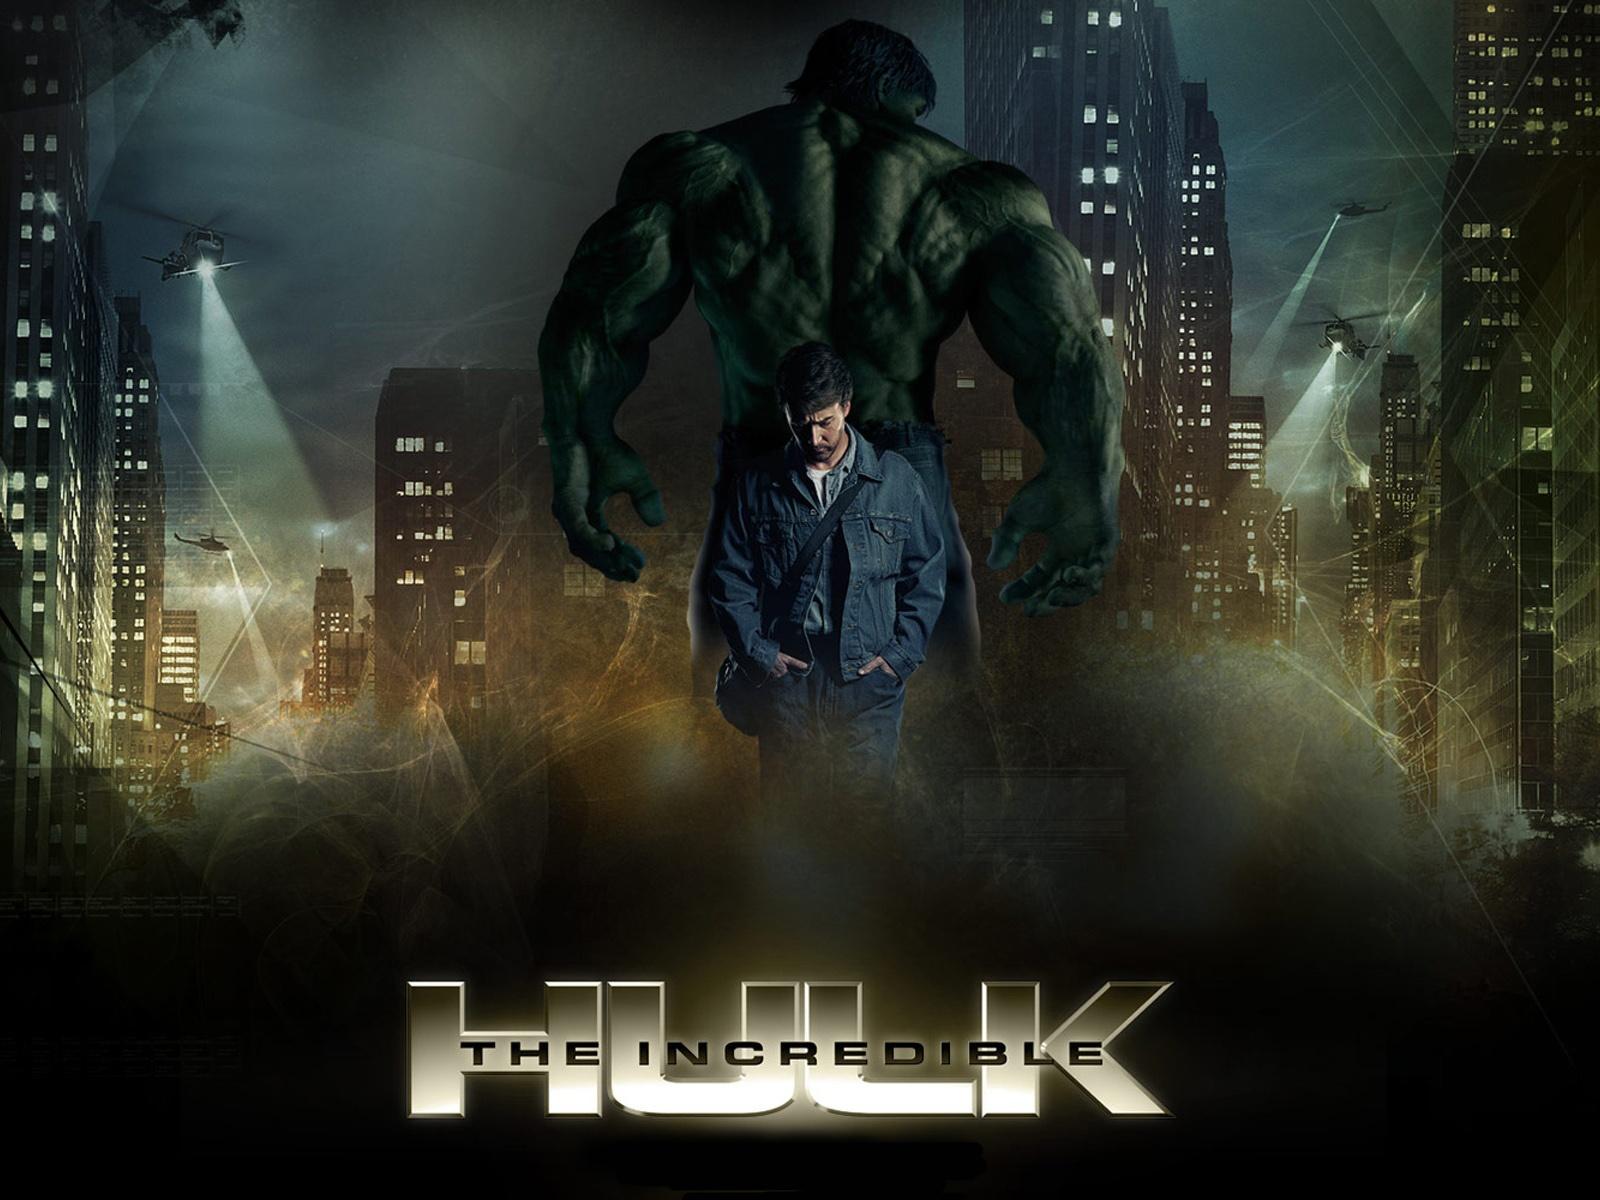 Wallpaper Hulk Hd 1920x1200 Hd Picture Image